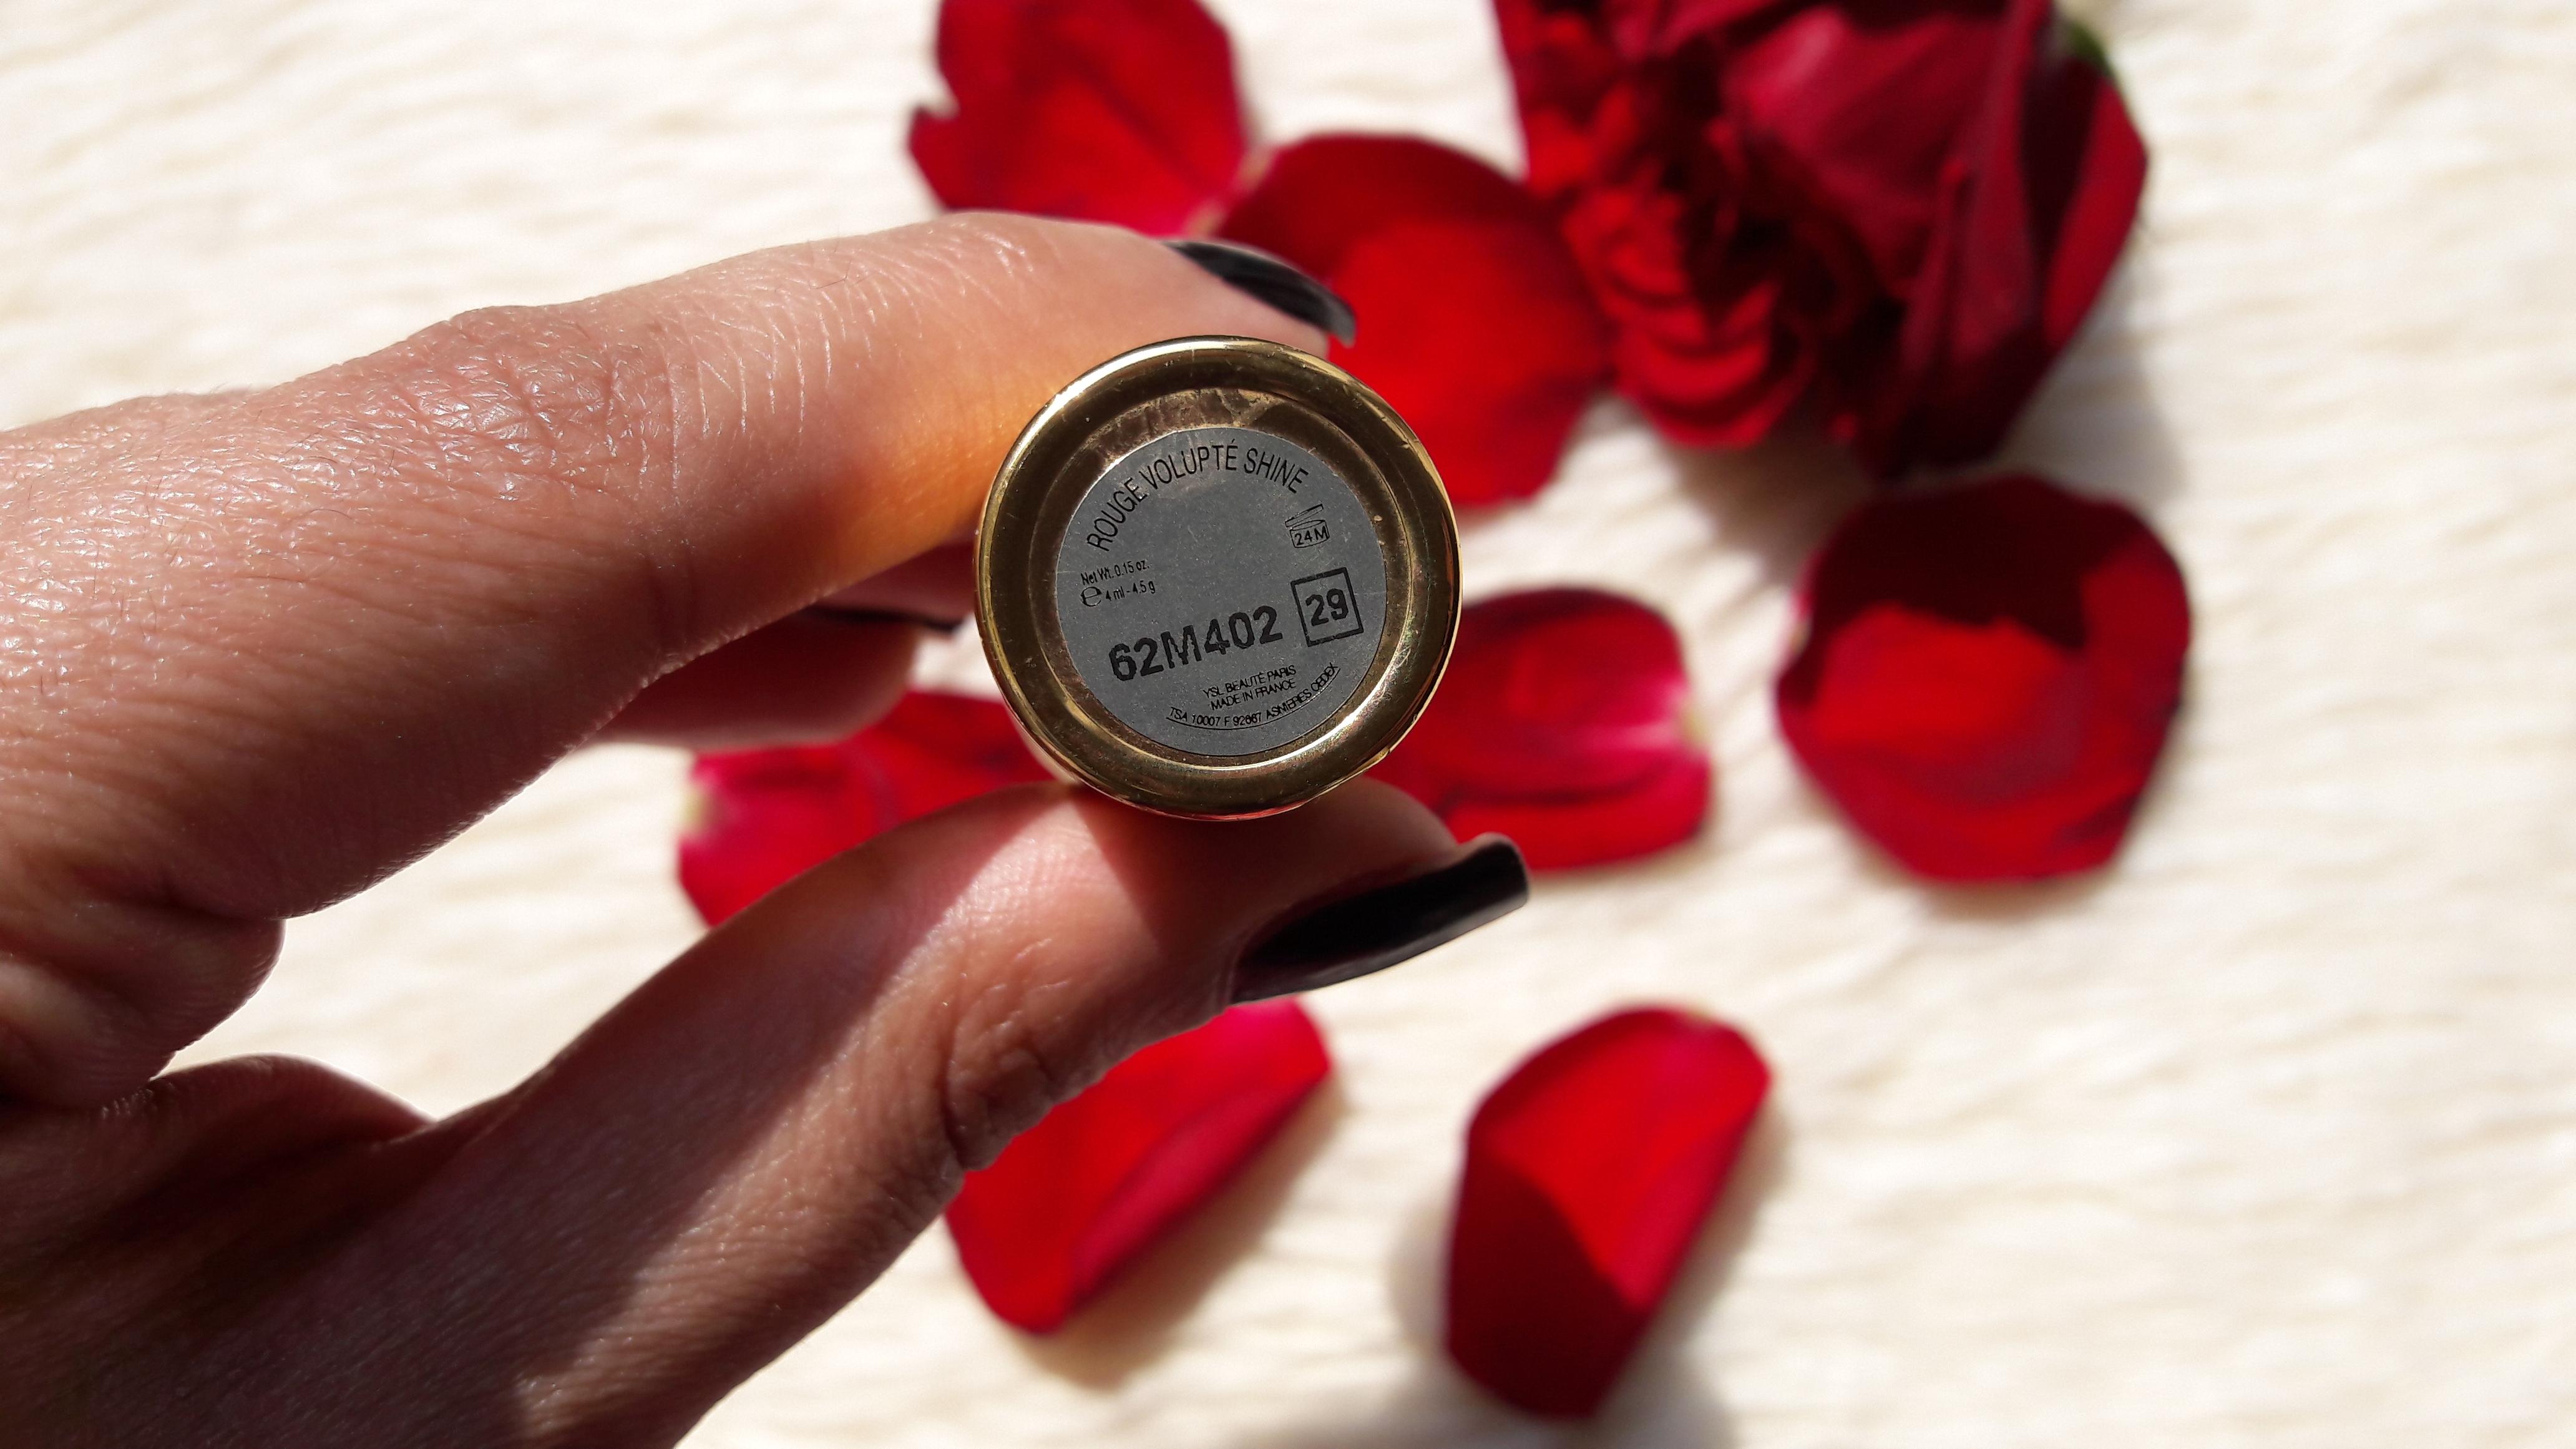 YSL Rouge Volupte Shine Lipstick Review